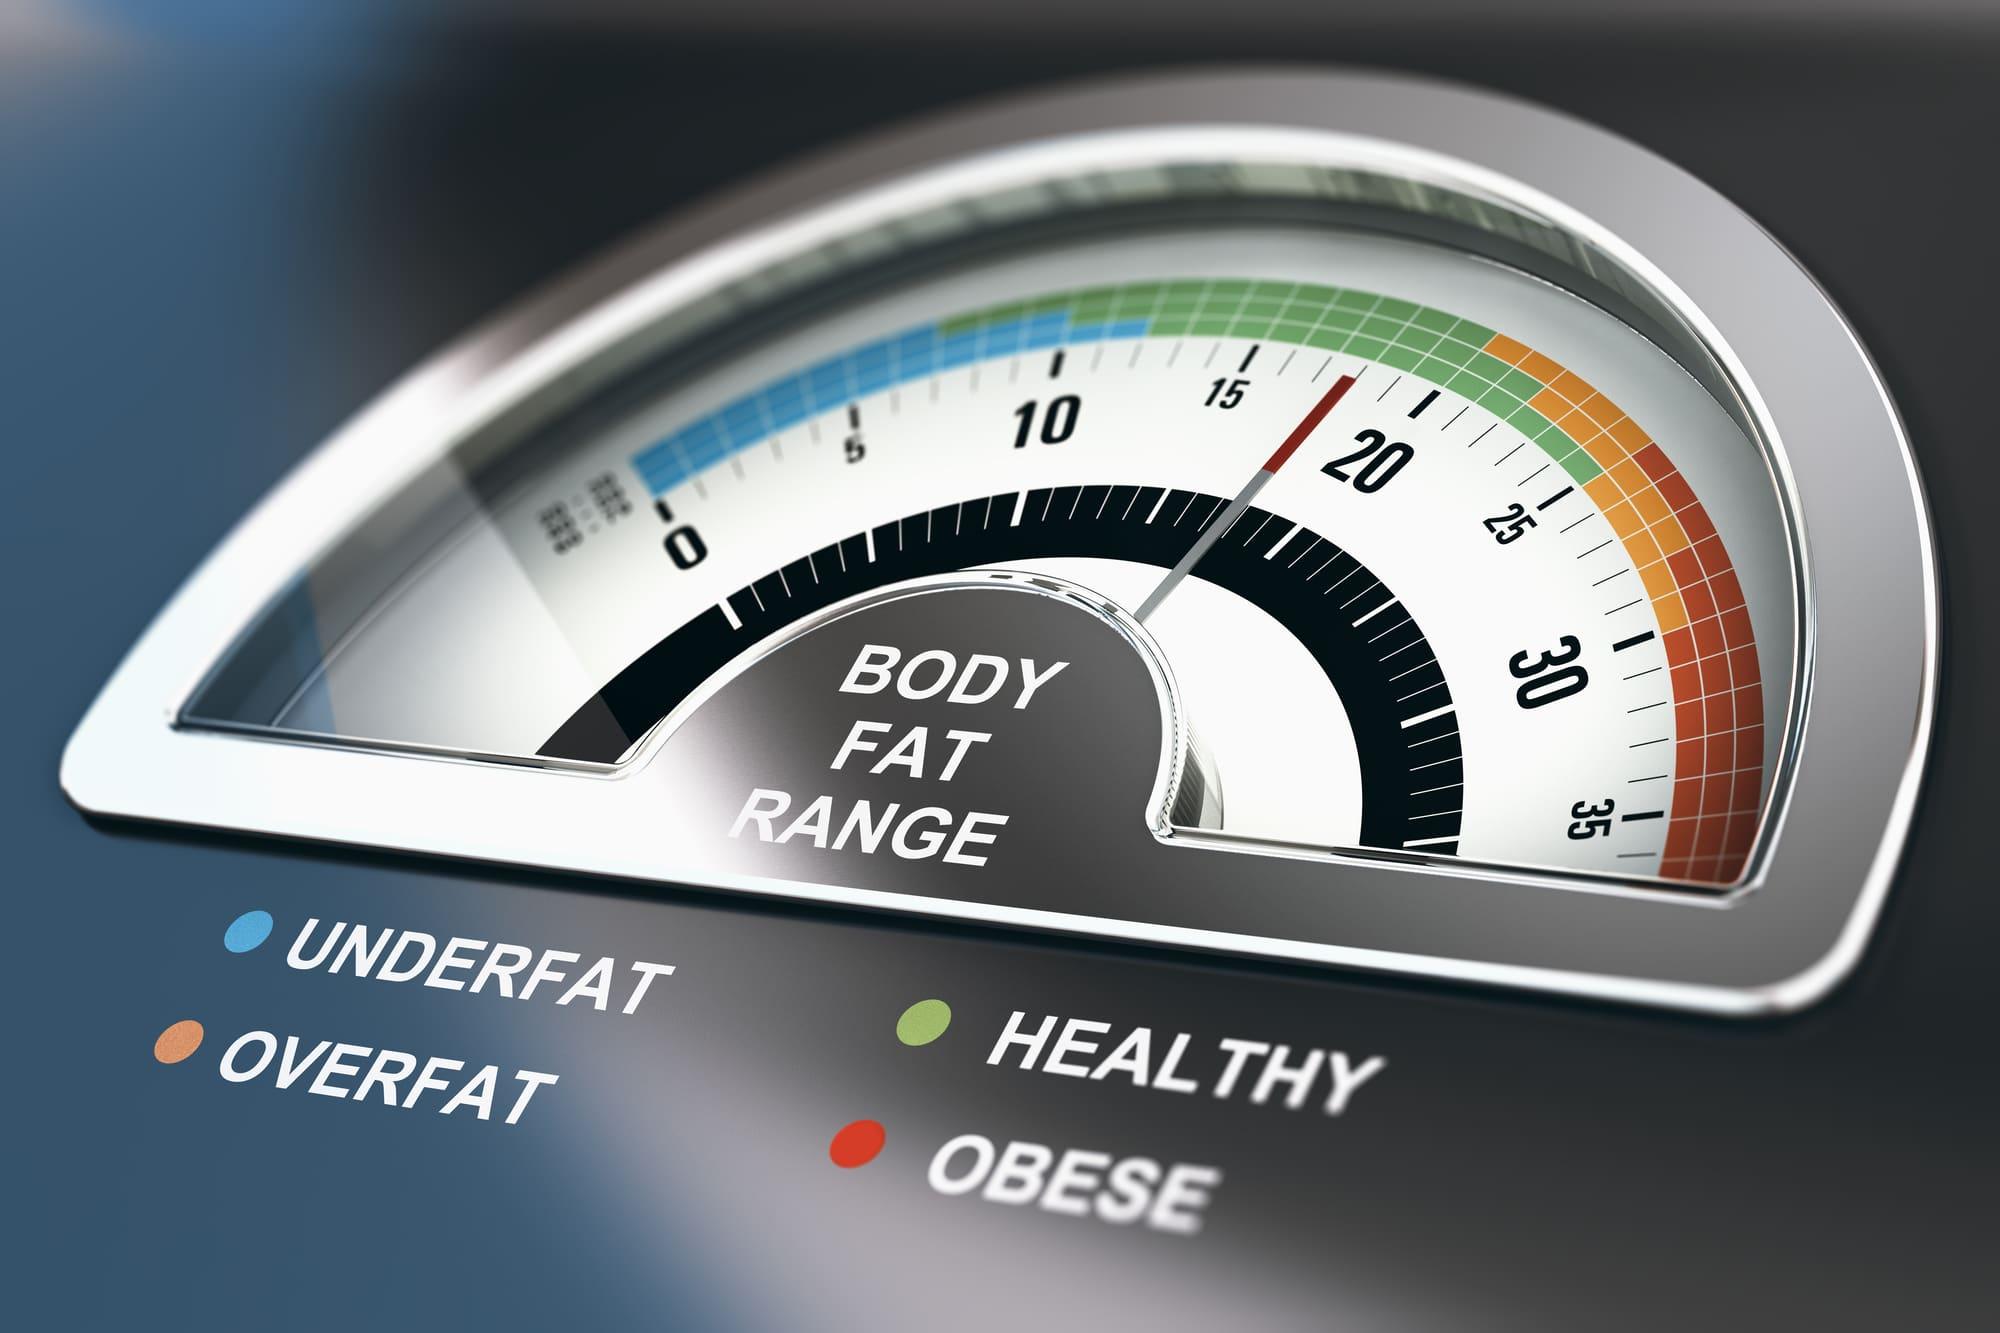 body fat range